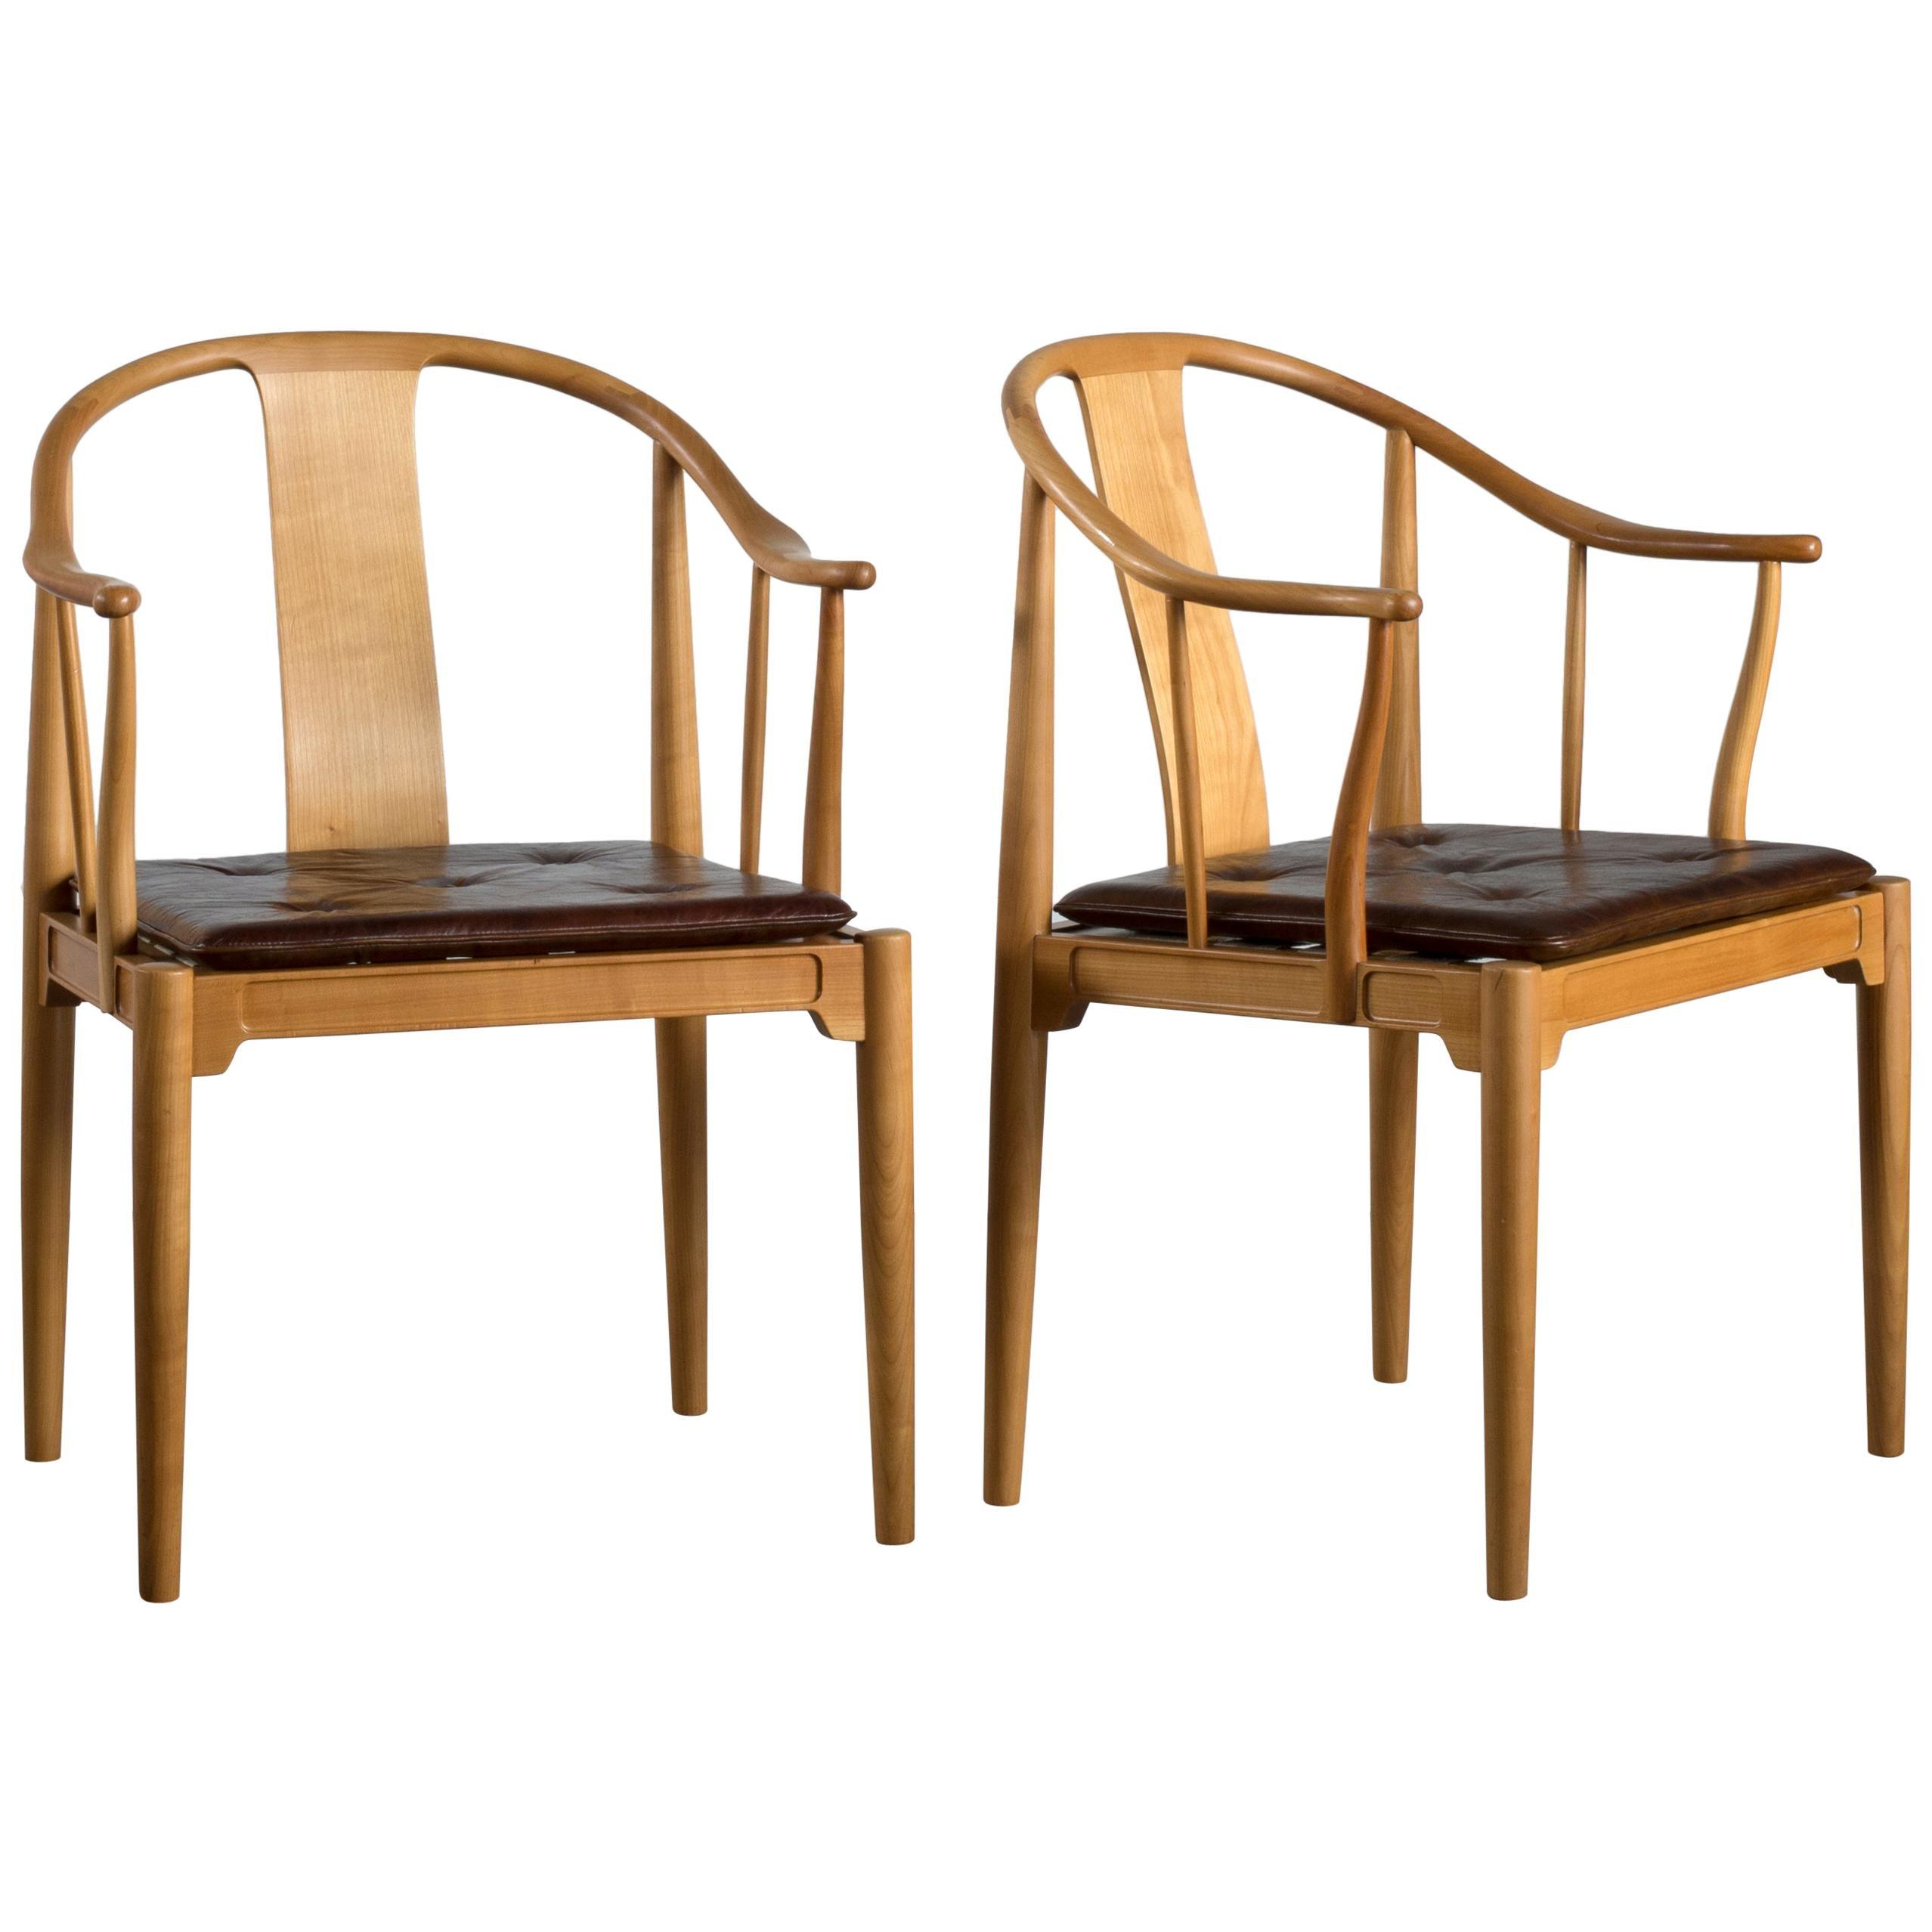 Pair of Hans J. Wegner Chinese Chairs of Cherrywood for Fritz Hansen